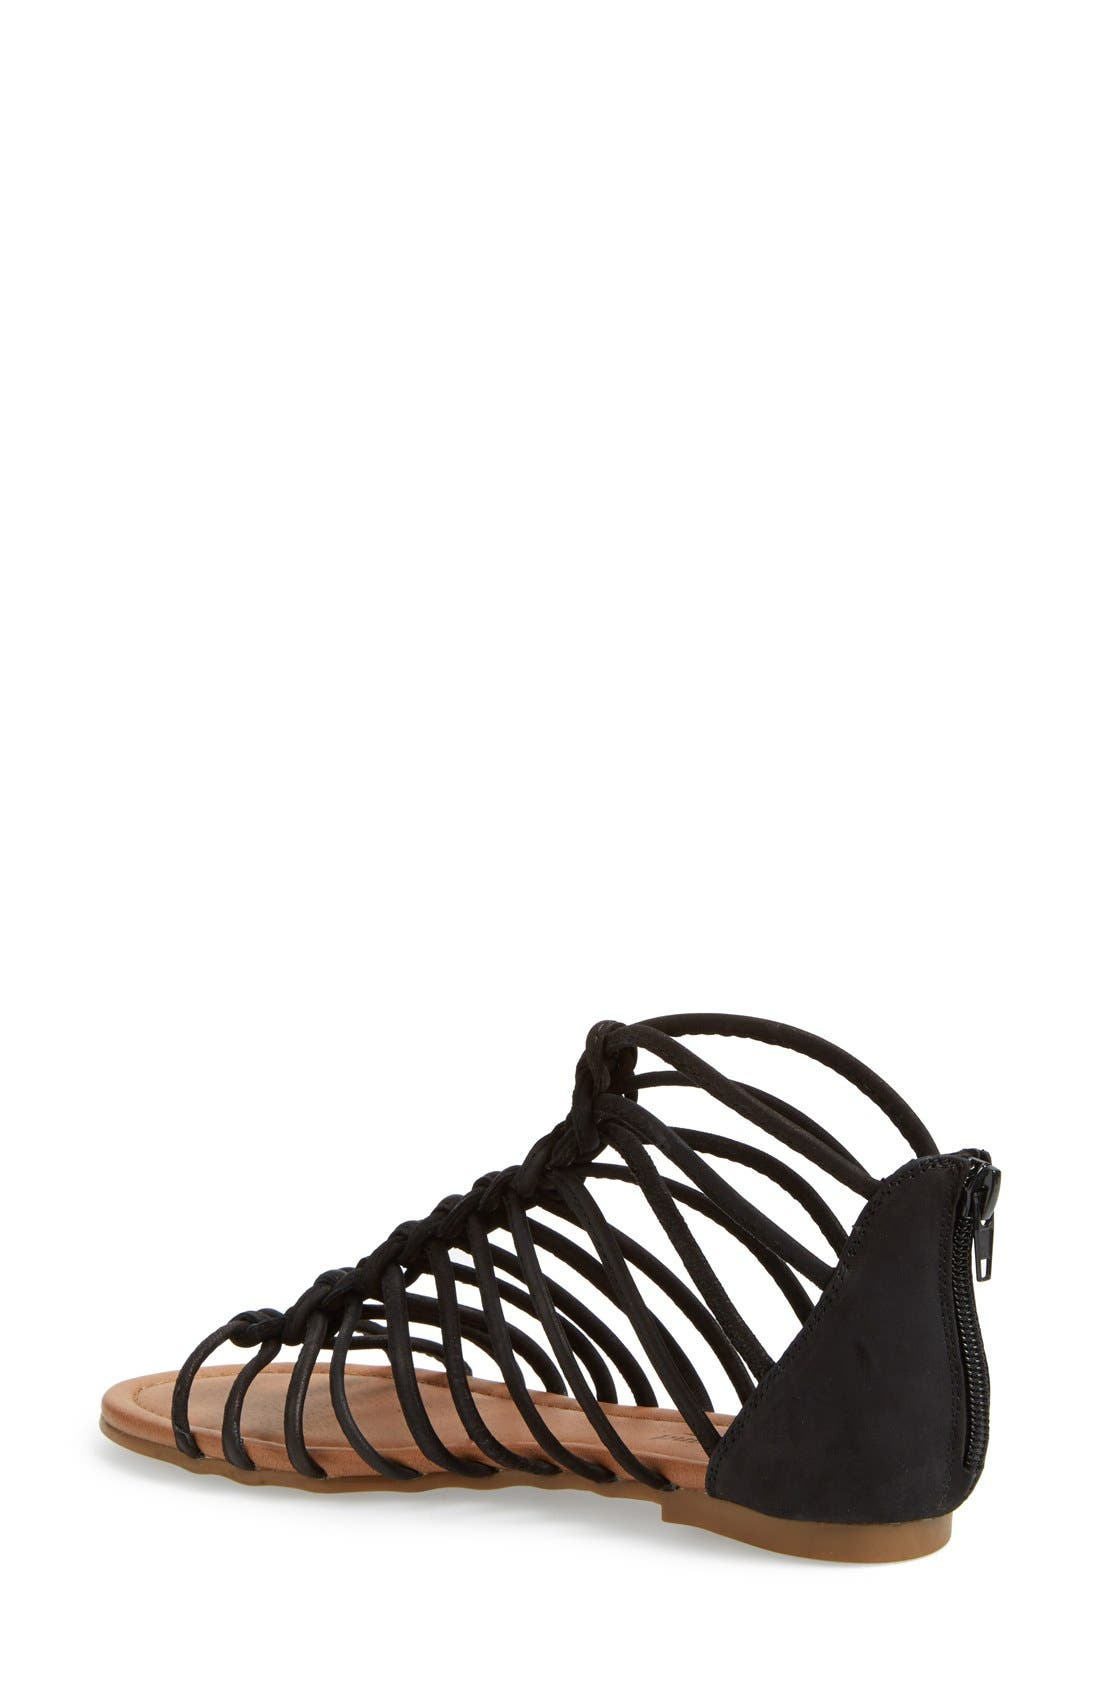 Alternate Image 2  - Lucky Brand 'Casmett' Leather Caged Sandal (Women)